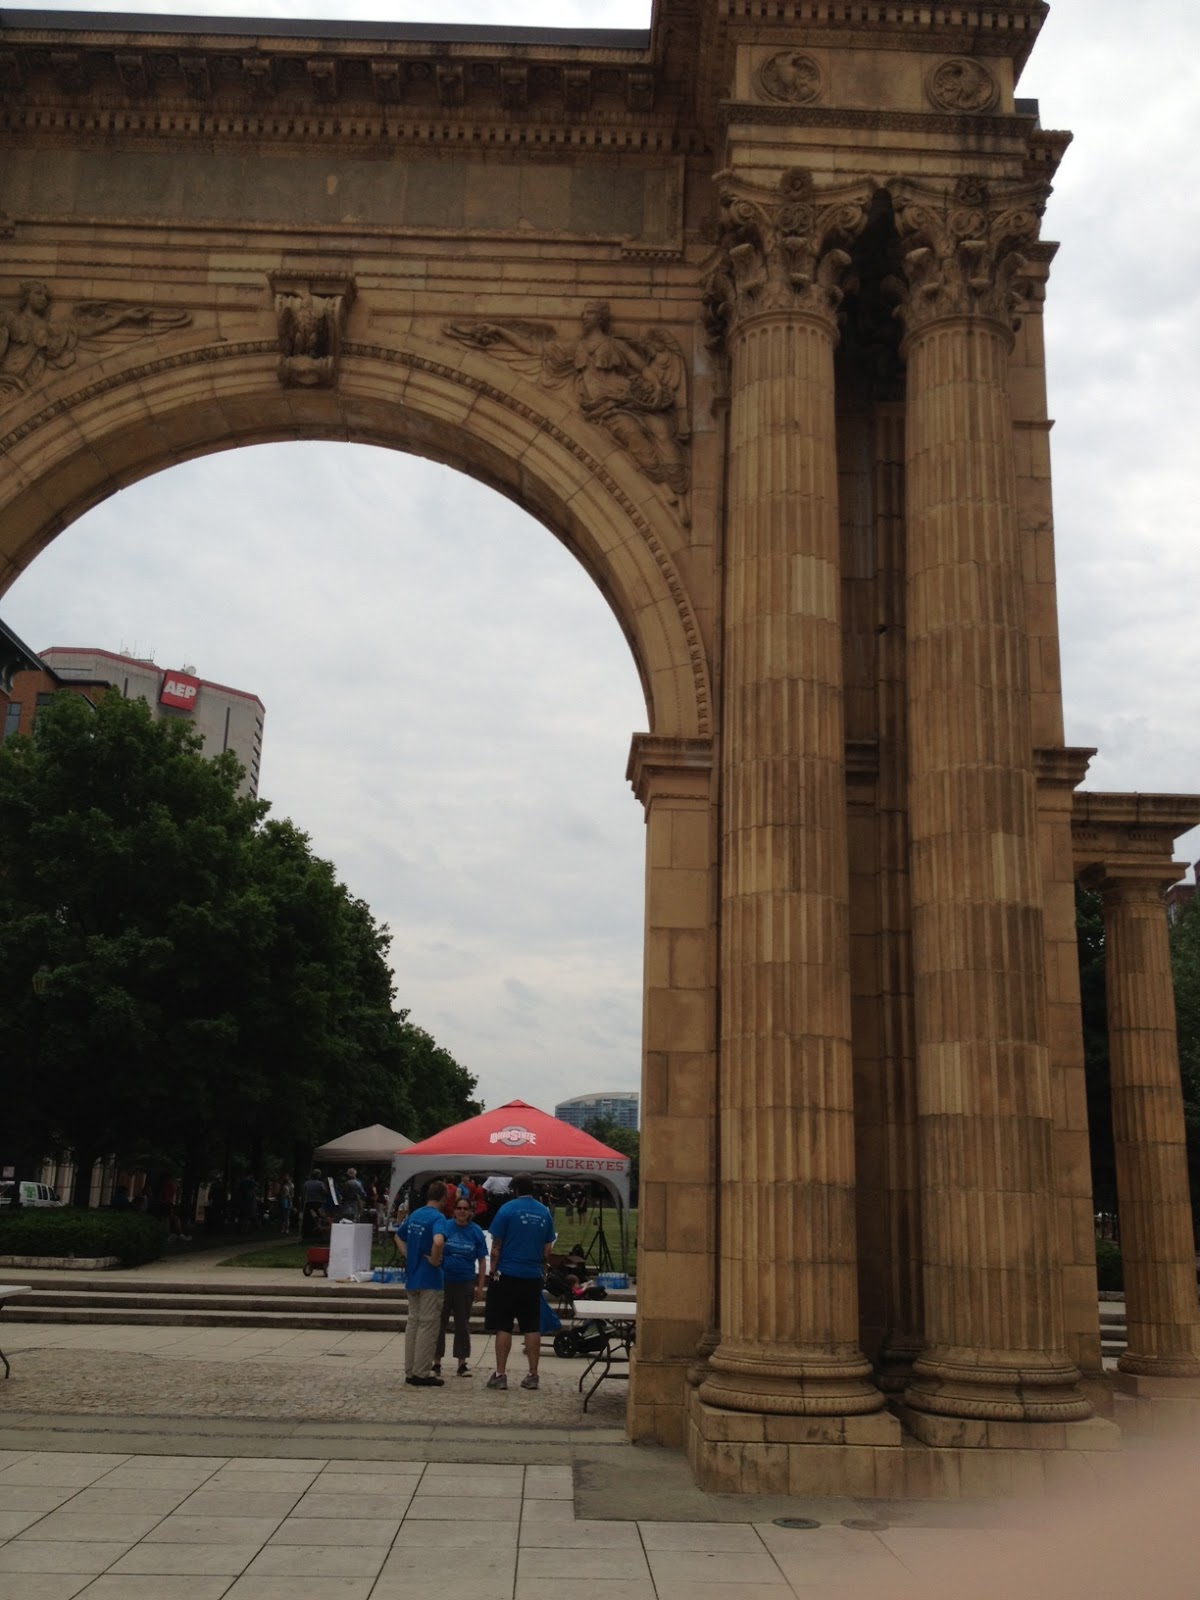 Ancient Roman Architecture: The Union Station Arch